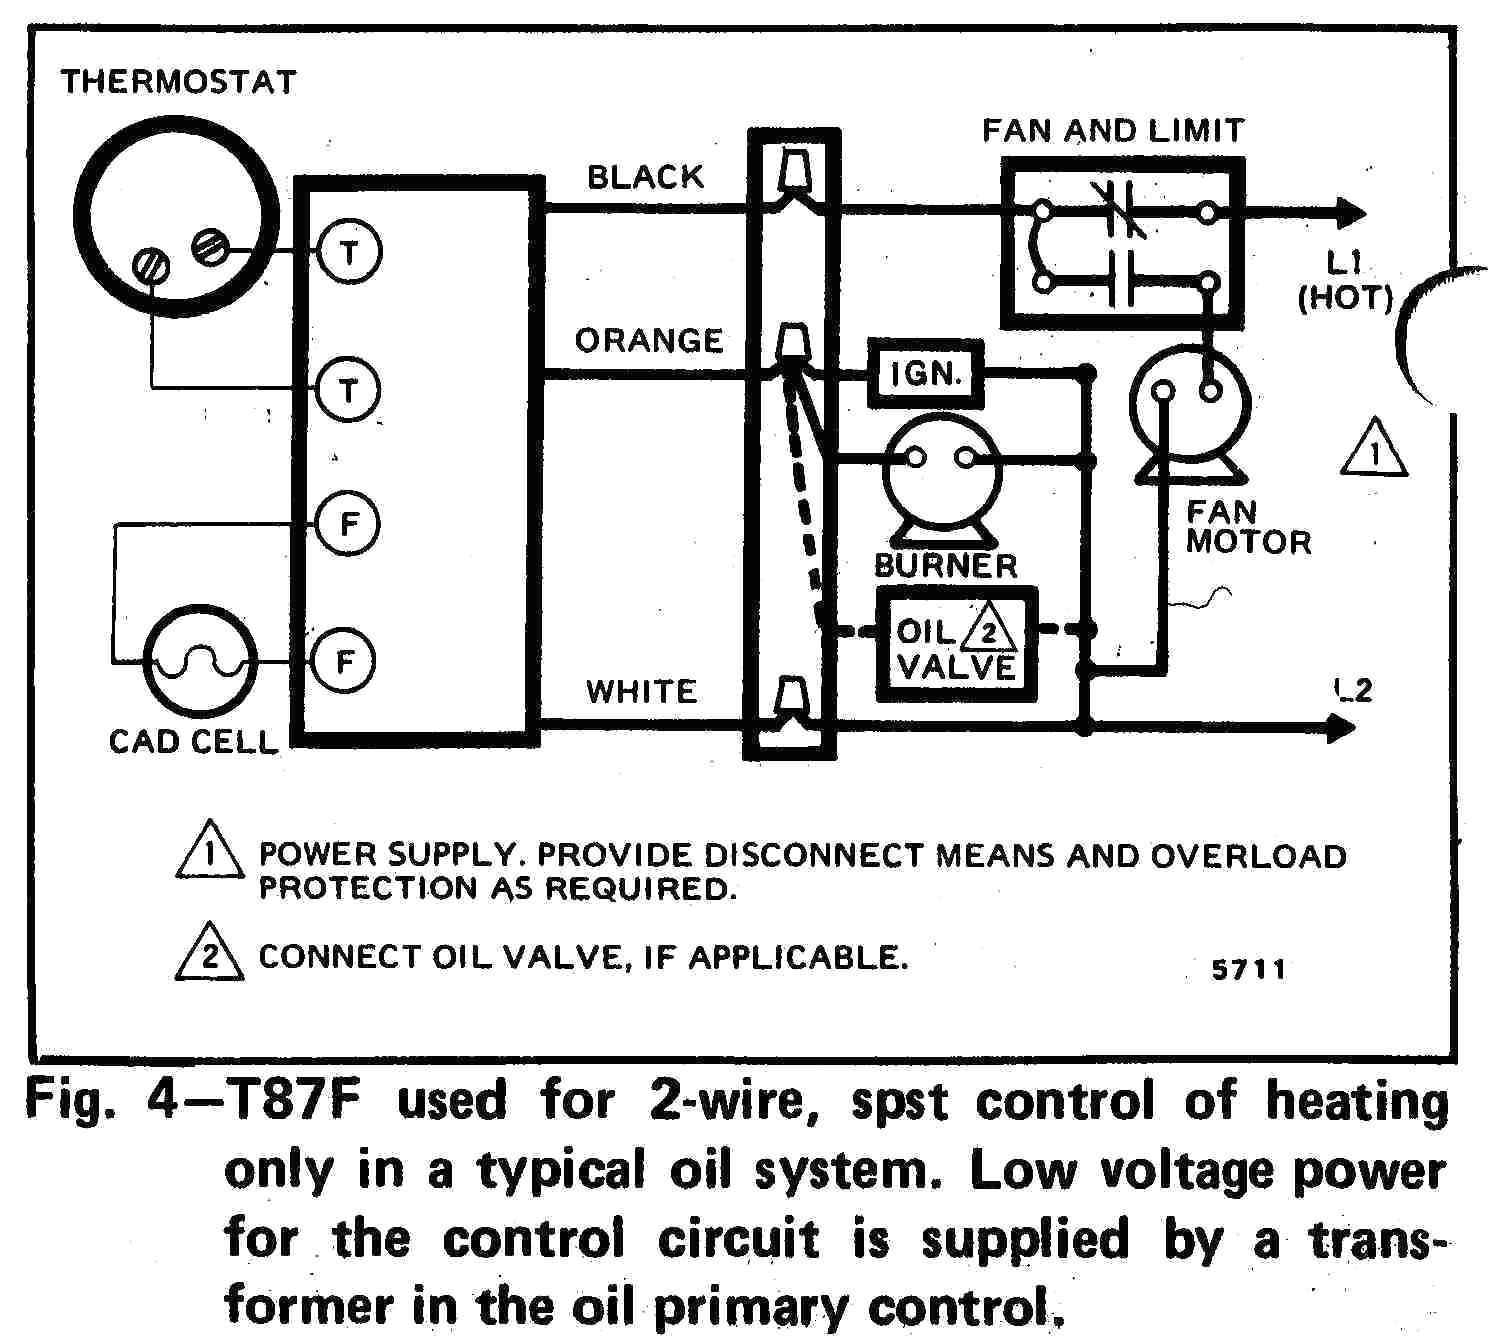 Electric Heat Strip Wiring Diagram New Goodman Hvac Diy Chatroom Home